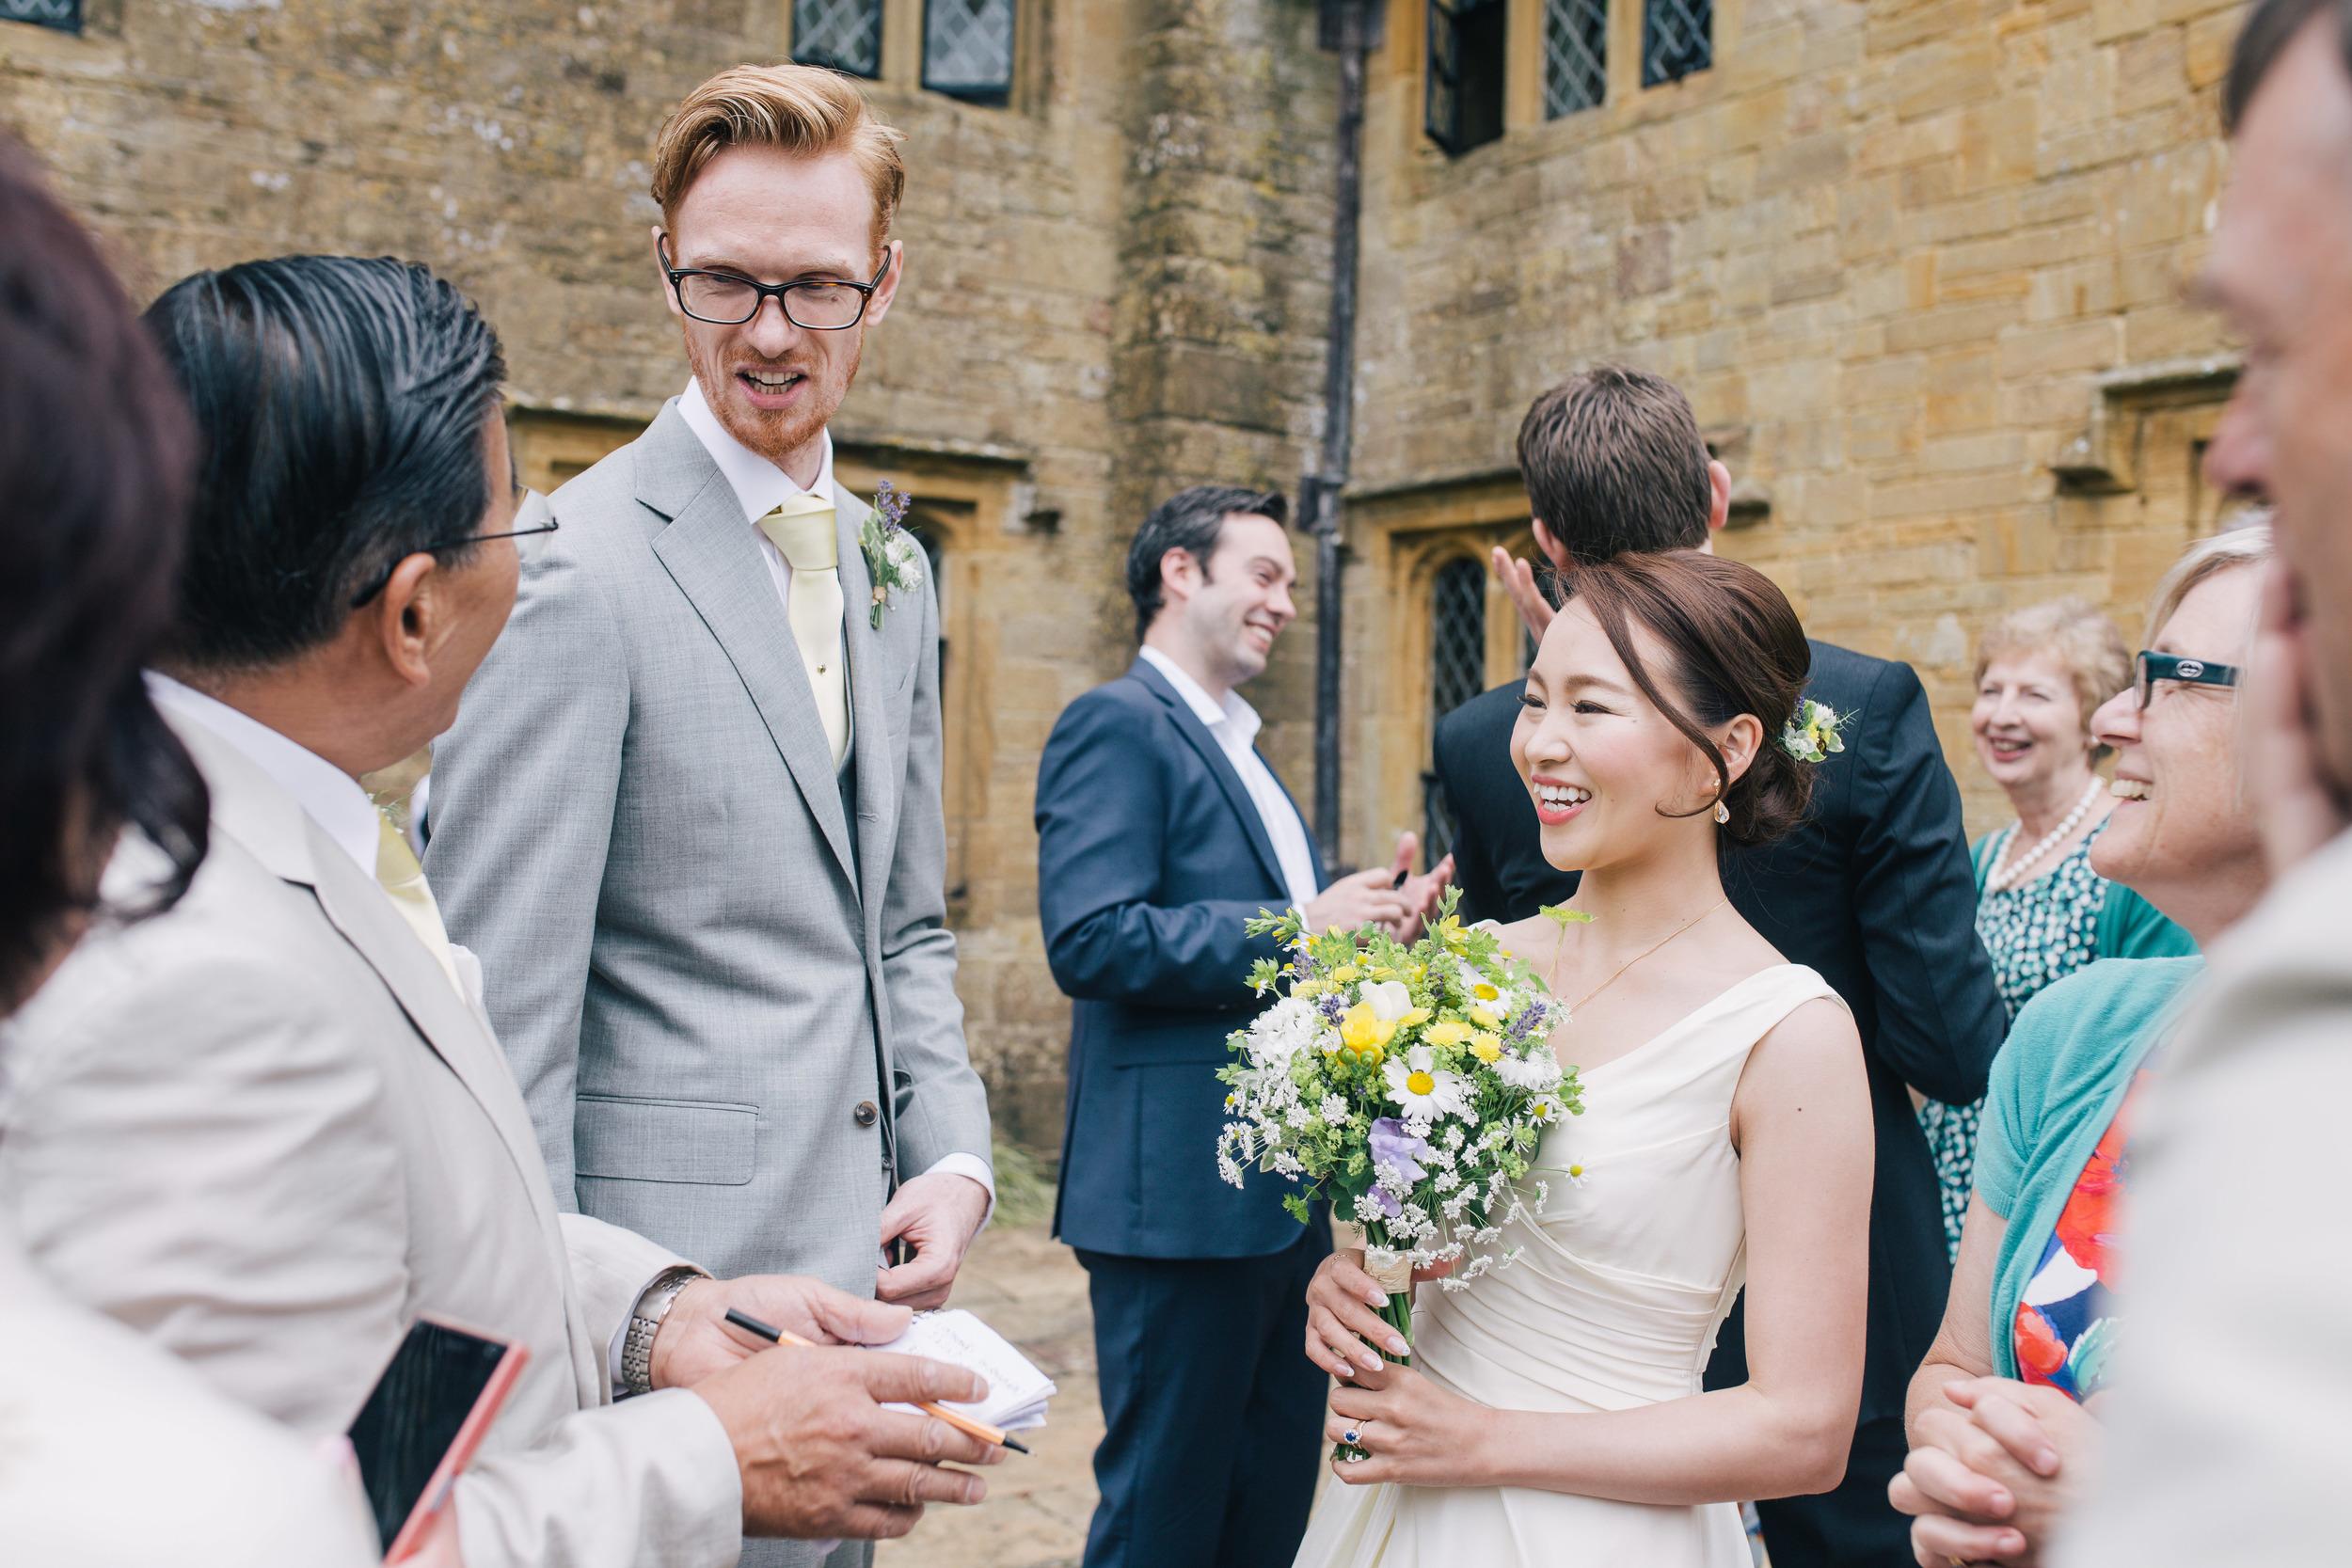 mahoka nick bailiffscourt wedding celebration-030.jpg